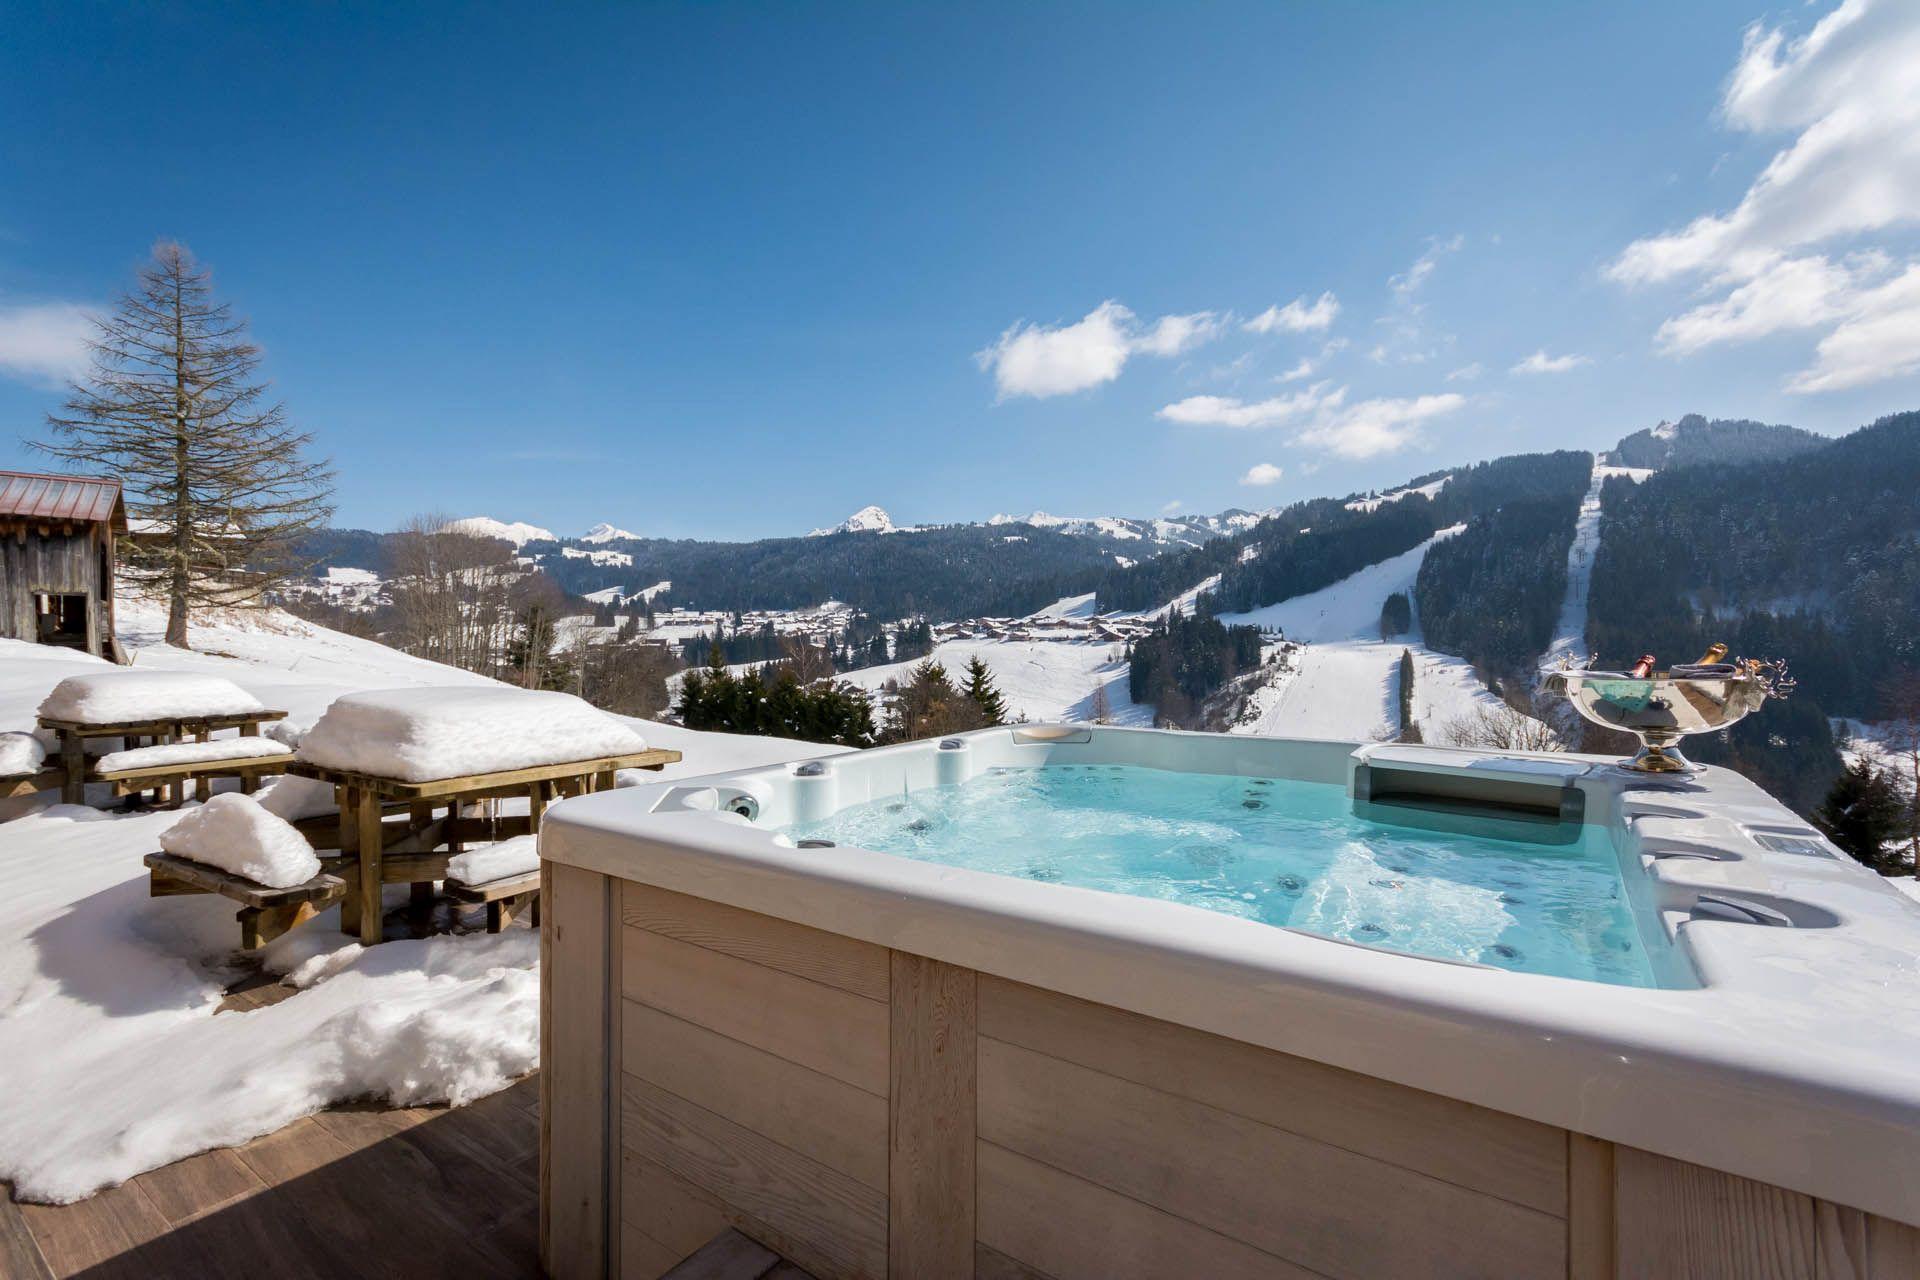 luxury alpine retreat, luxury mountain retreat, luxury ski retreat, luxury chalets